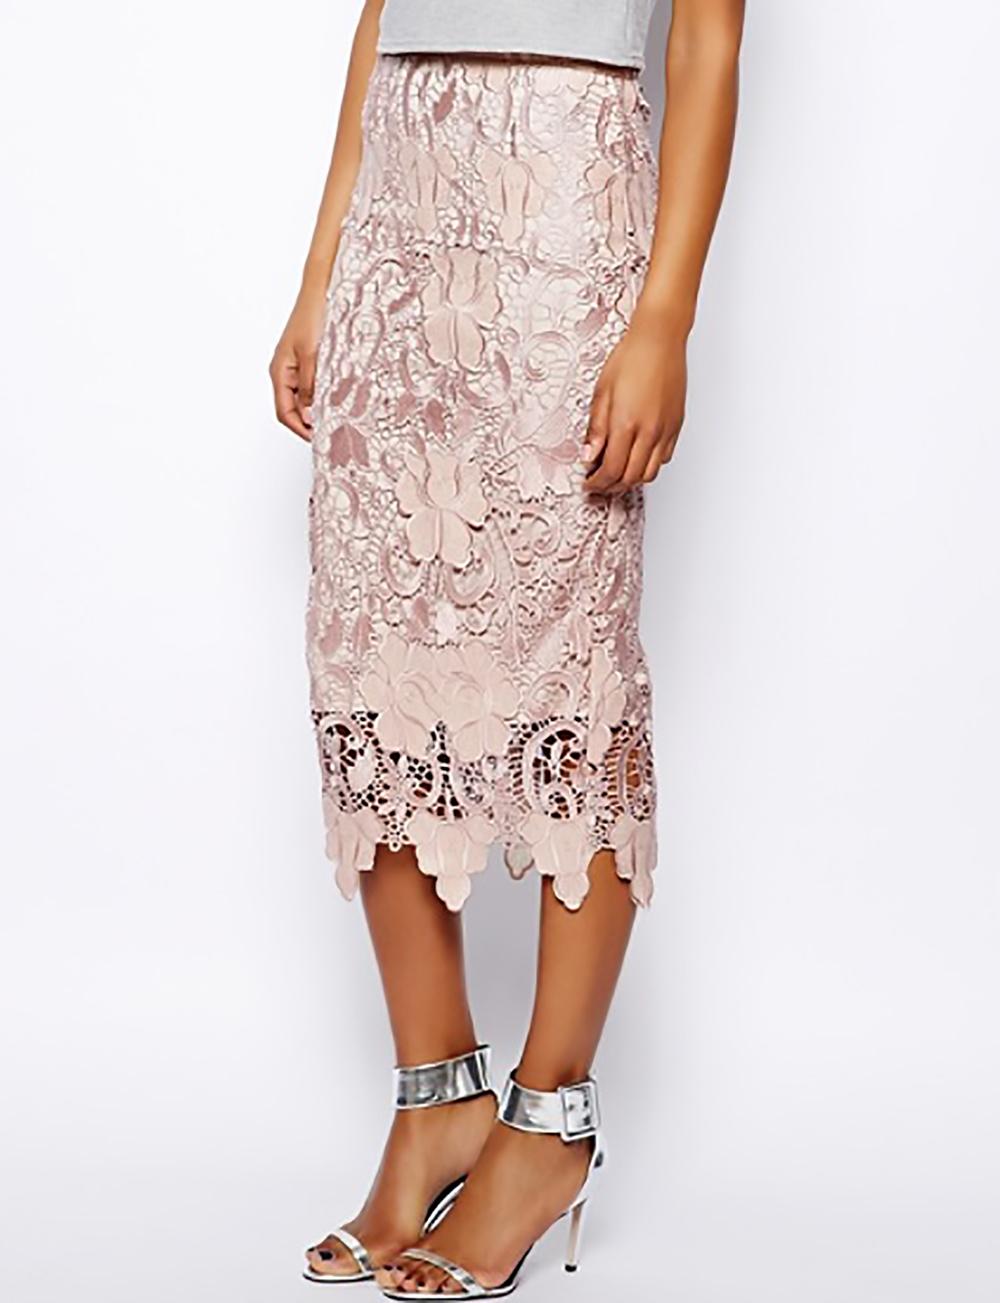 Asos river island lace pencil skirt with scalloped hem slip 1500.jpg